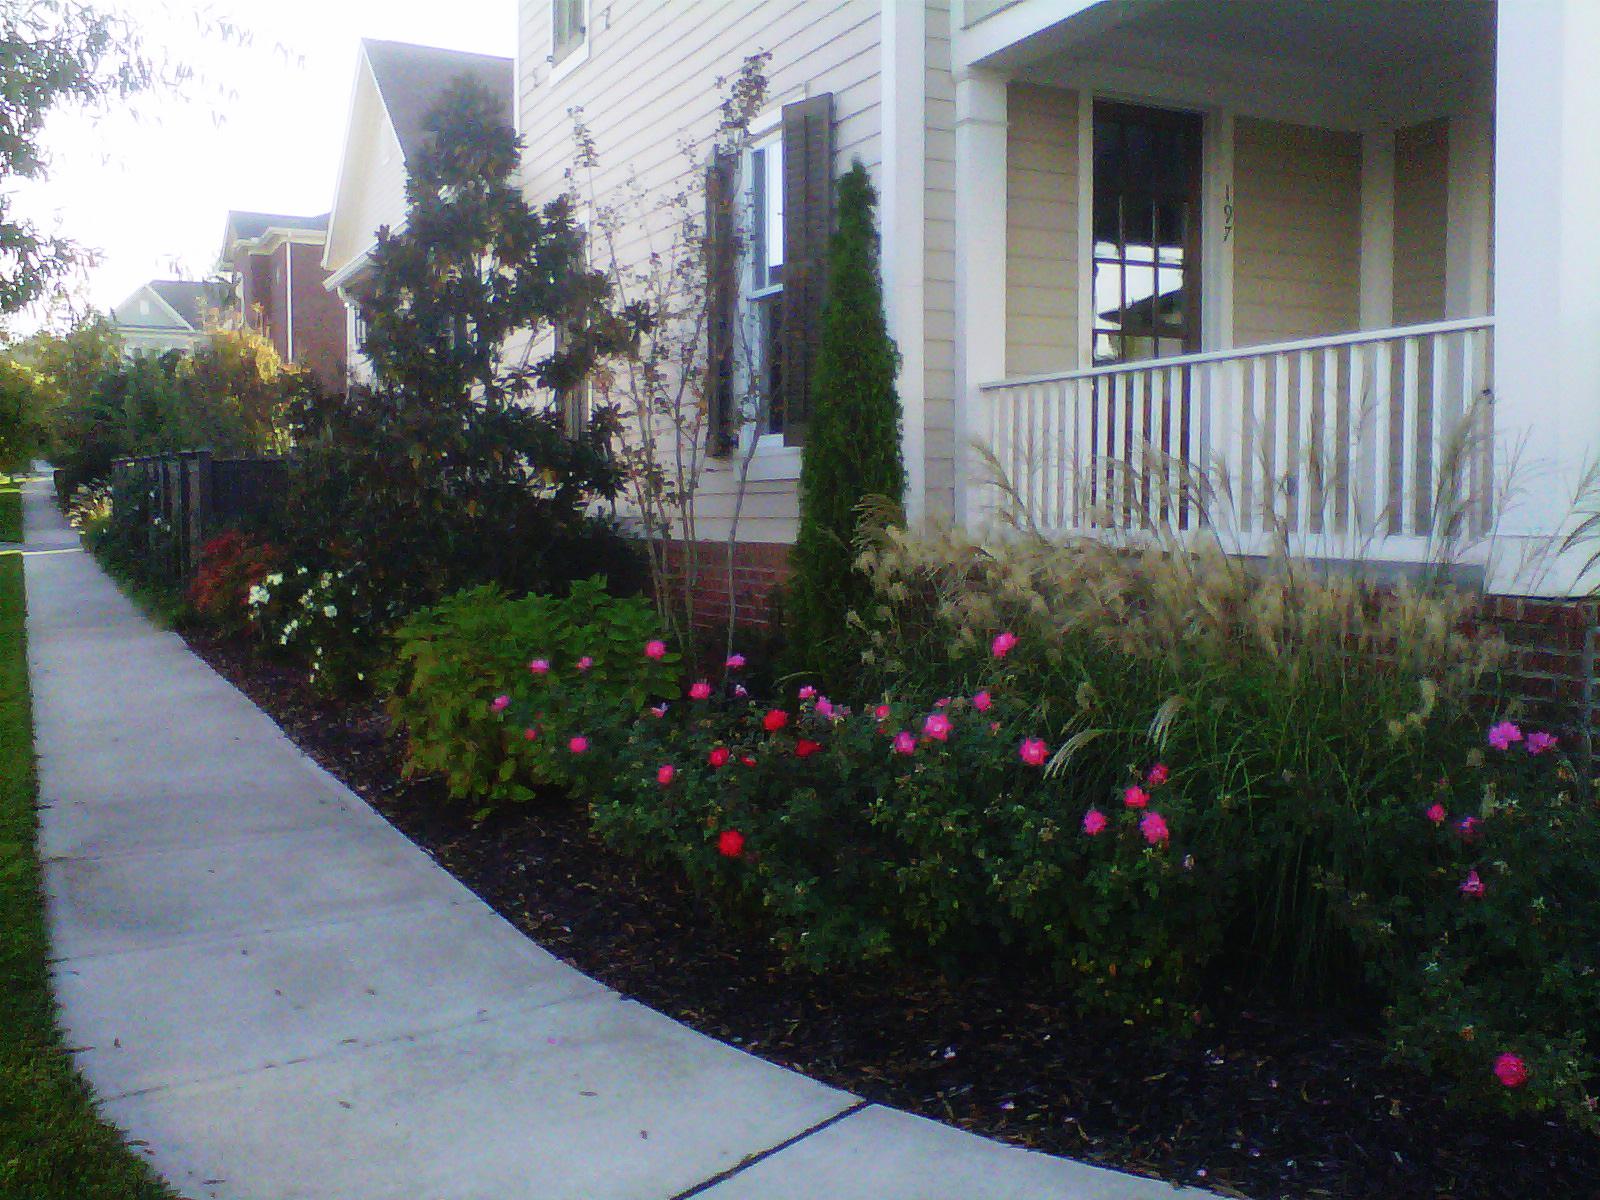 Justin Stelter Landscape Gardening - Modern Suburban Landscaping - 12591730903_eec2a65fda_o.jpg